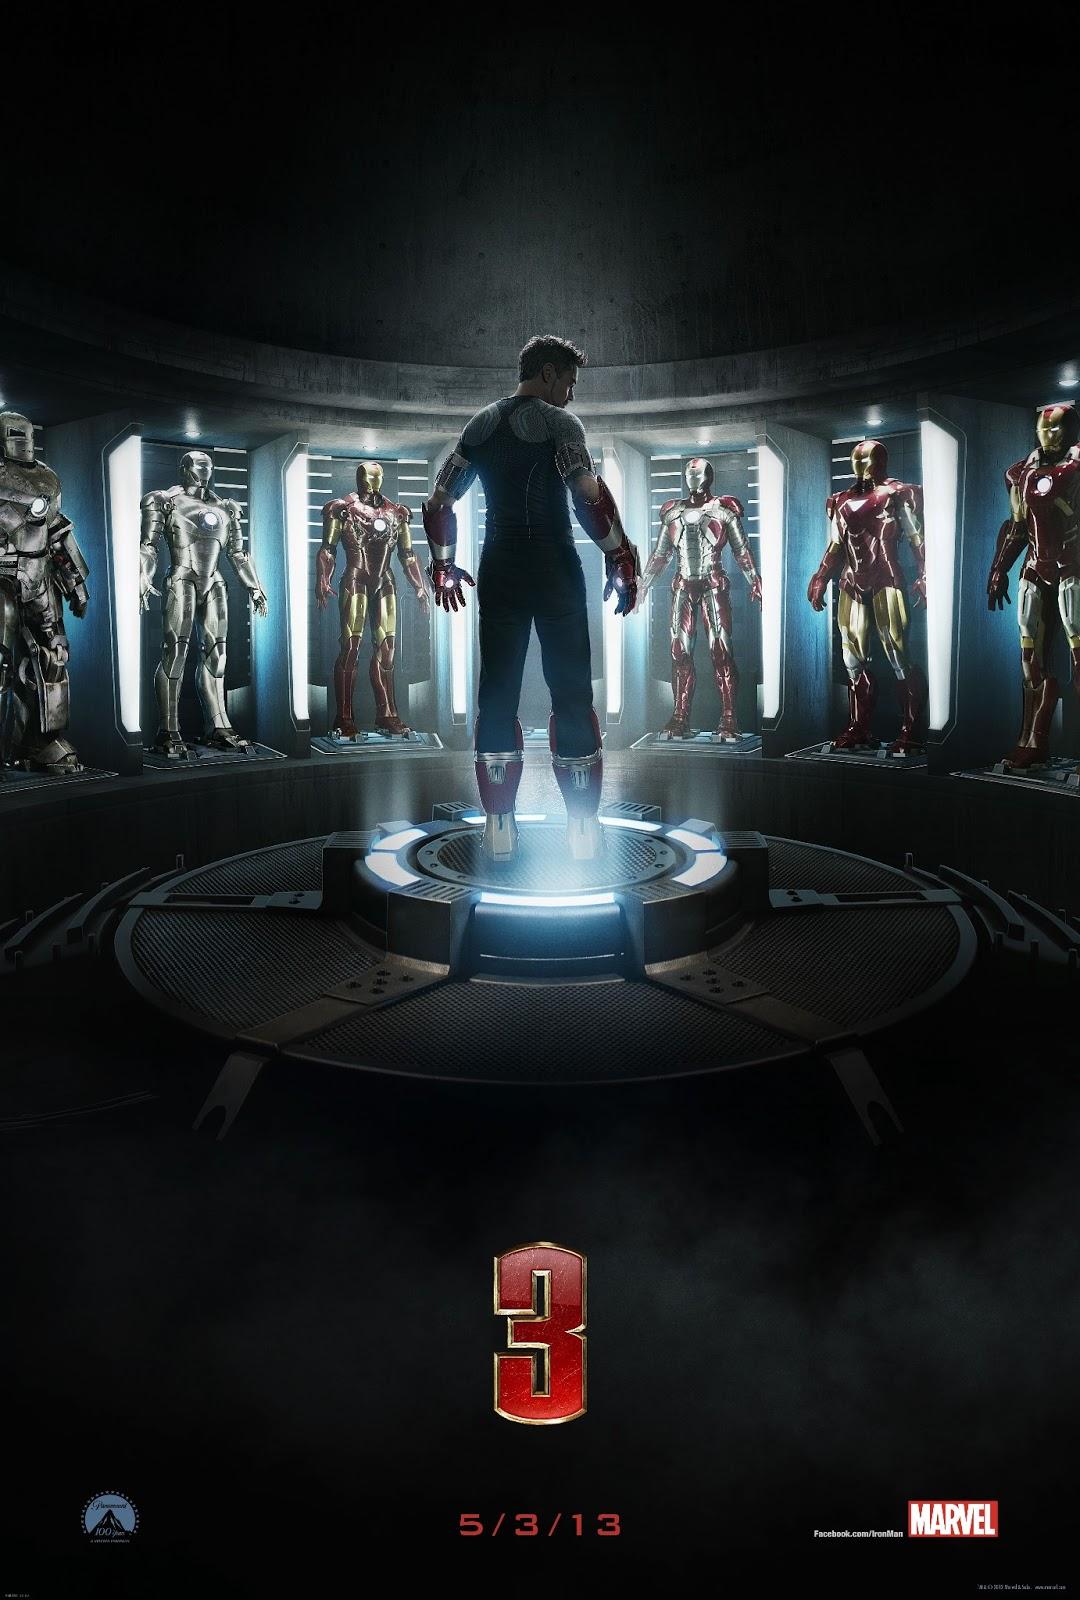 http://3.bp.blogspot.com/-5NTVjsLy4w4/US5Sqs6thcI/AAAAAAAAPV0/6uU2RqevhB0/s1600/iron-man-3-poster.jpg